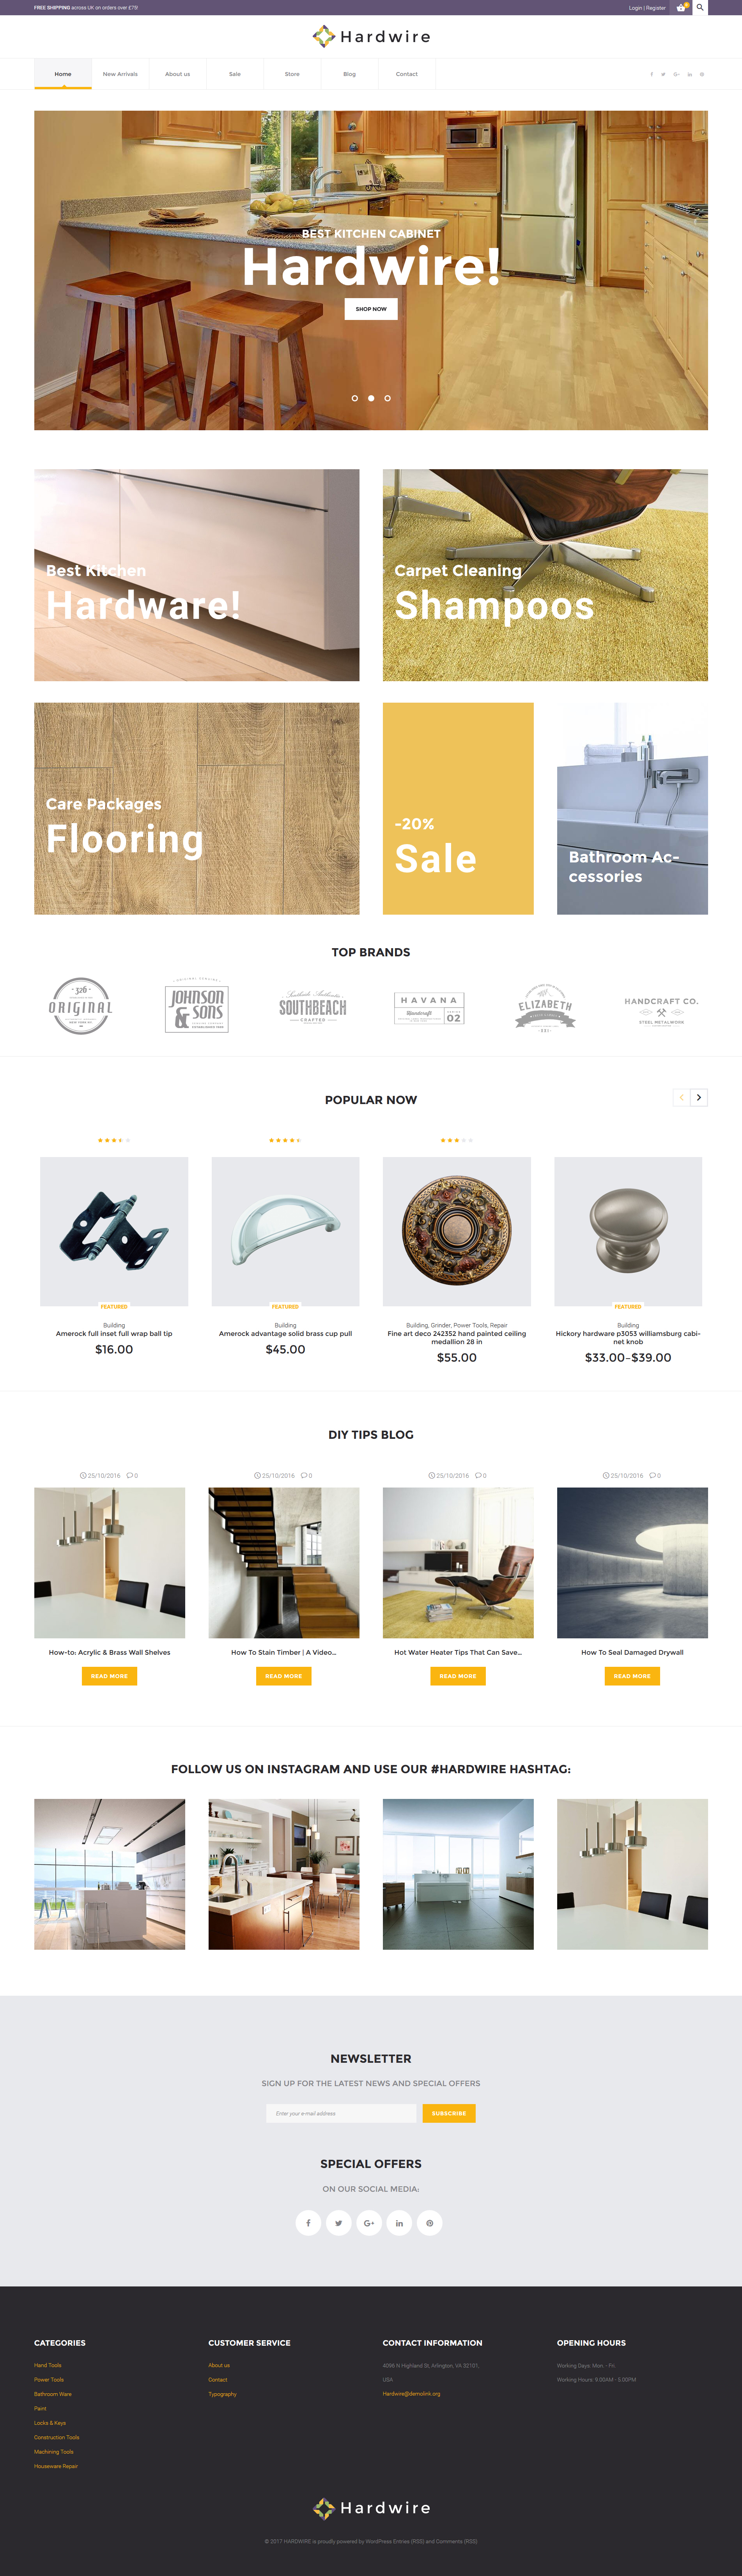 Hardwire - Household Hardware Store Responsive WooCommerce Theme